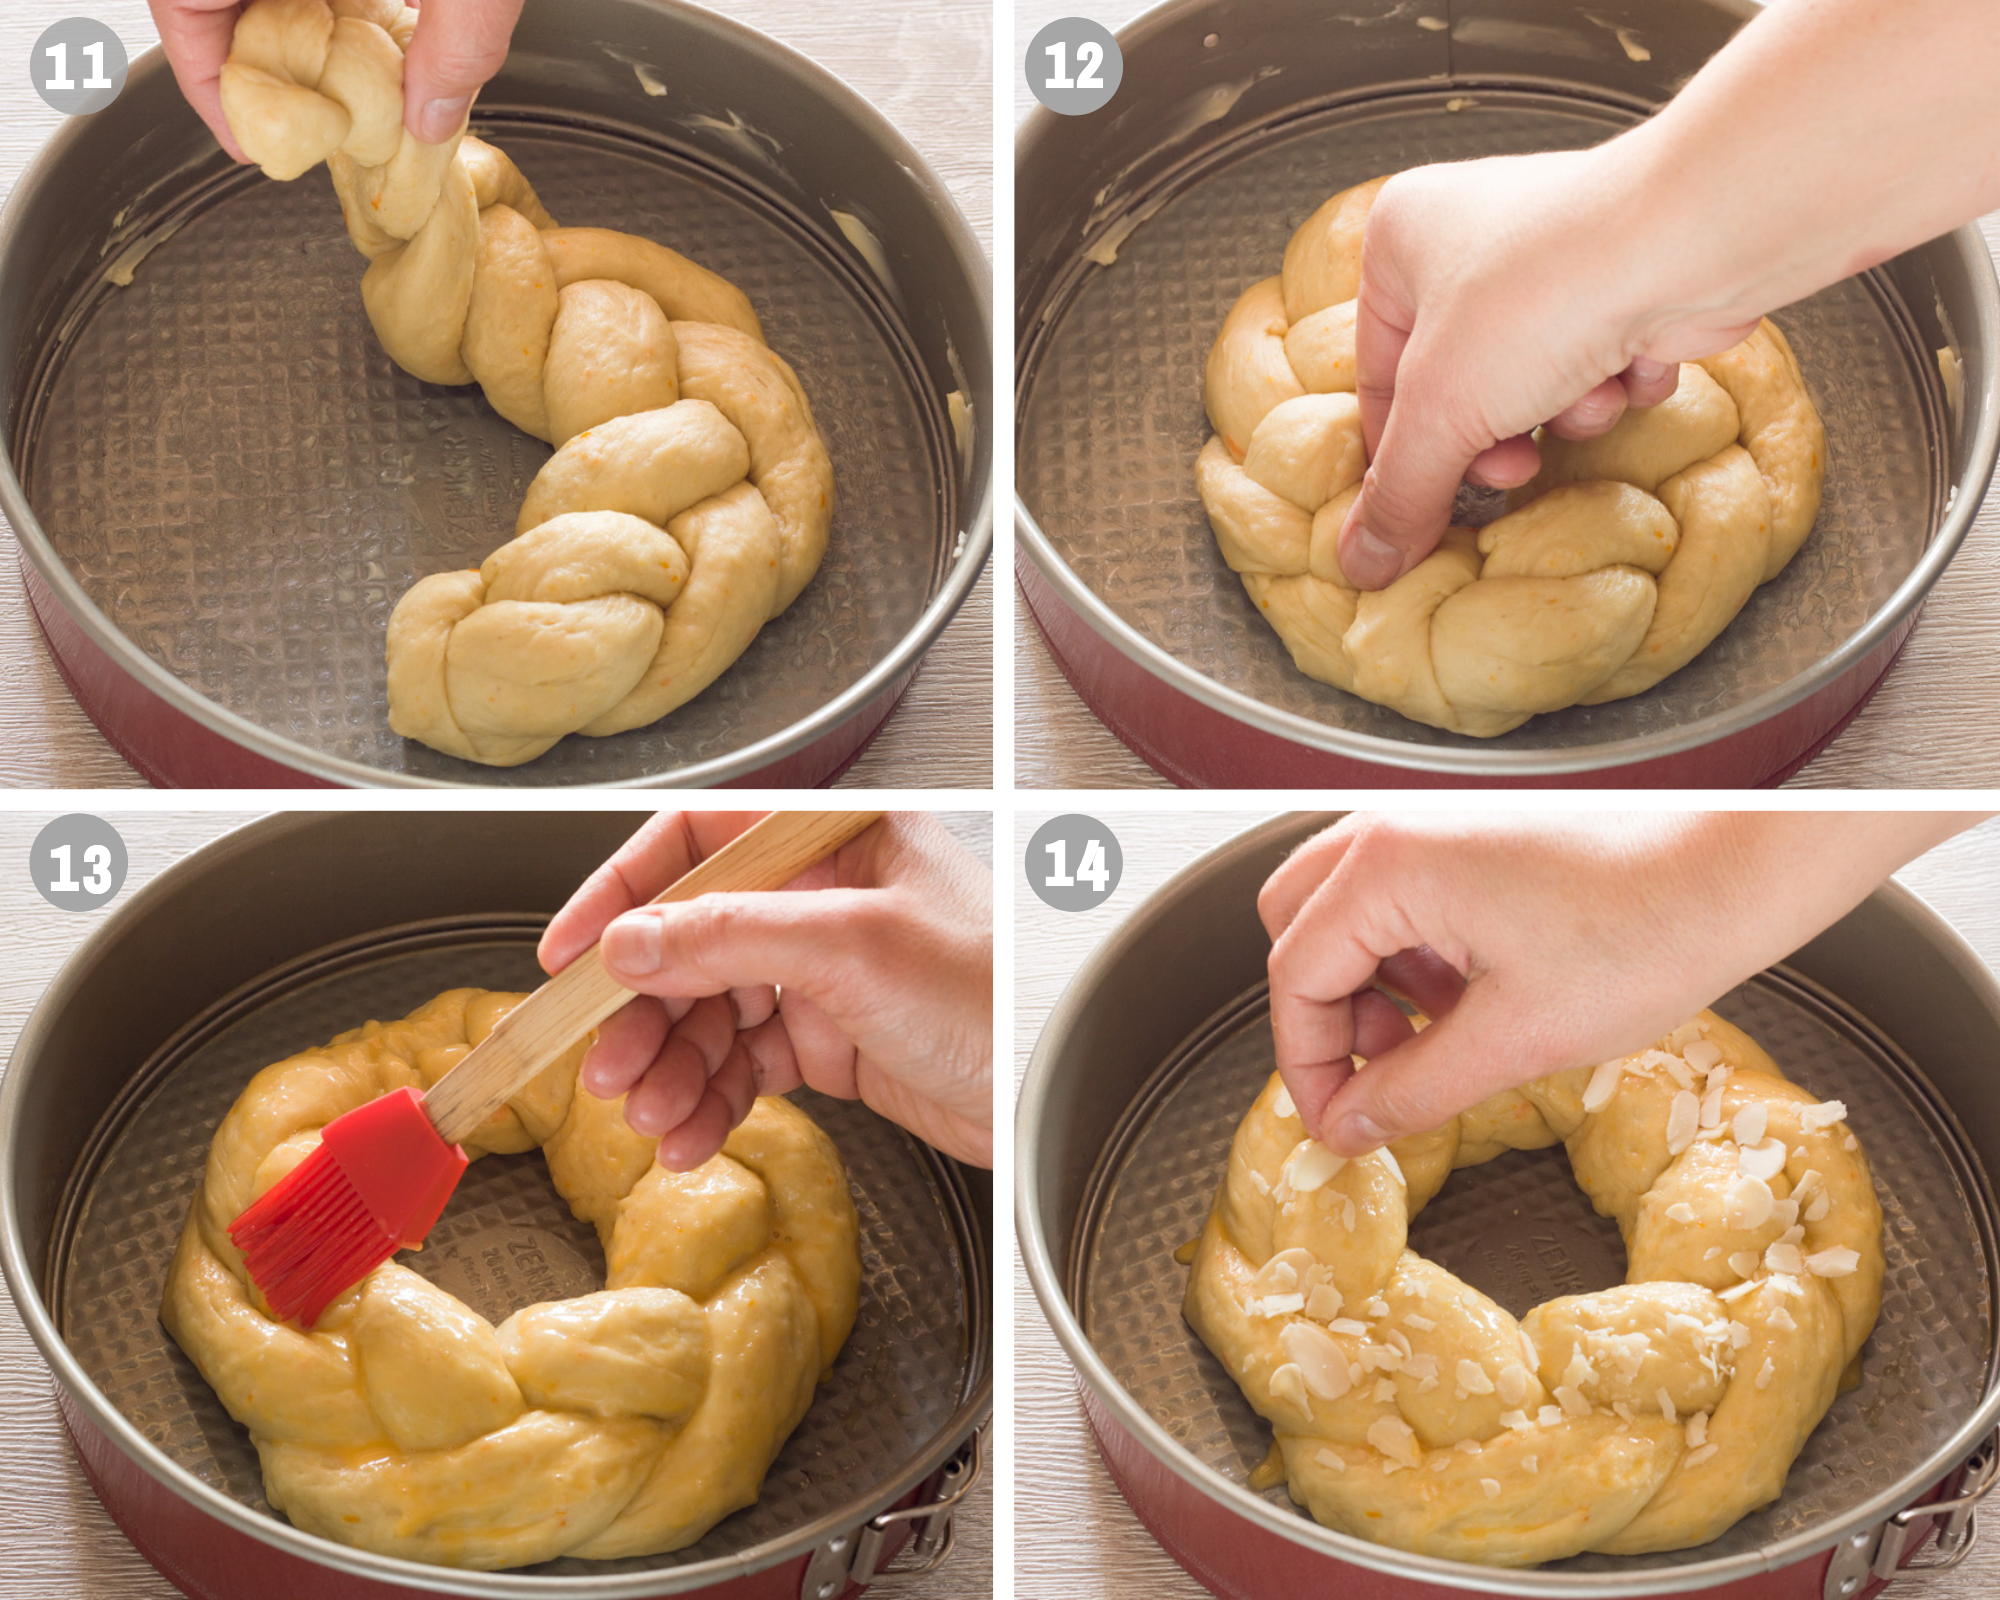 how to braid tsoureki steps 11-14